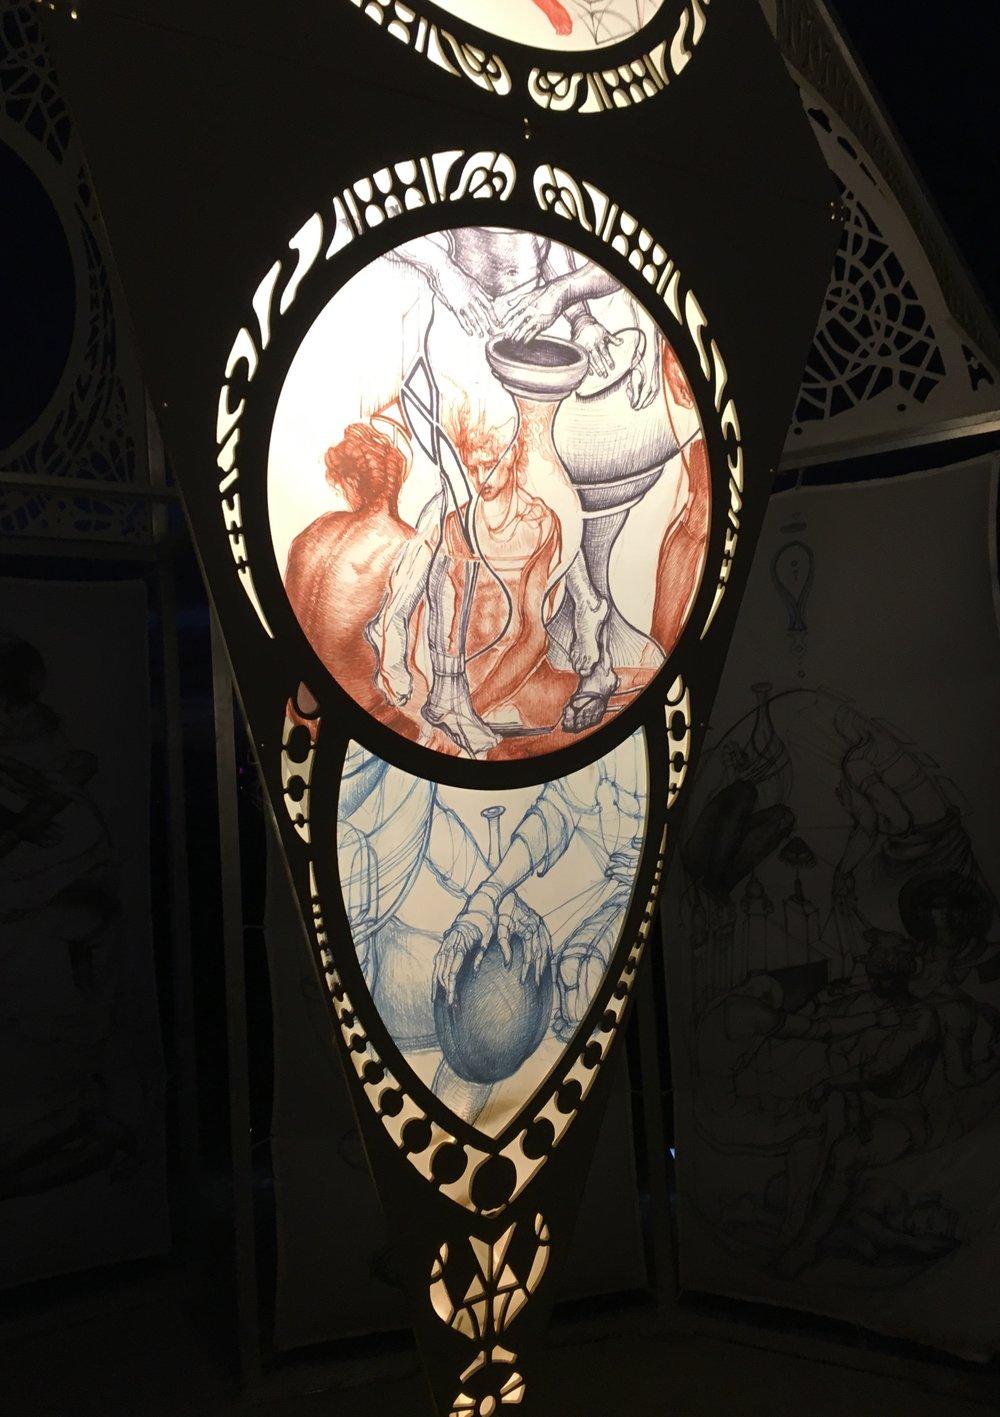 Maria kreyn - chapel of dancing shadows 5.jpg